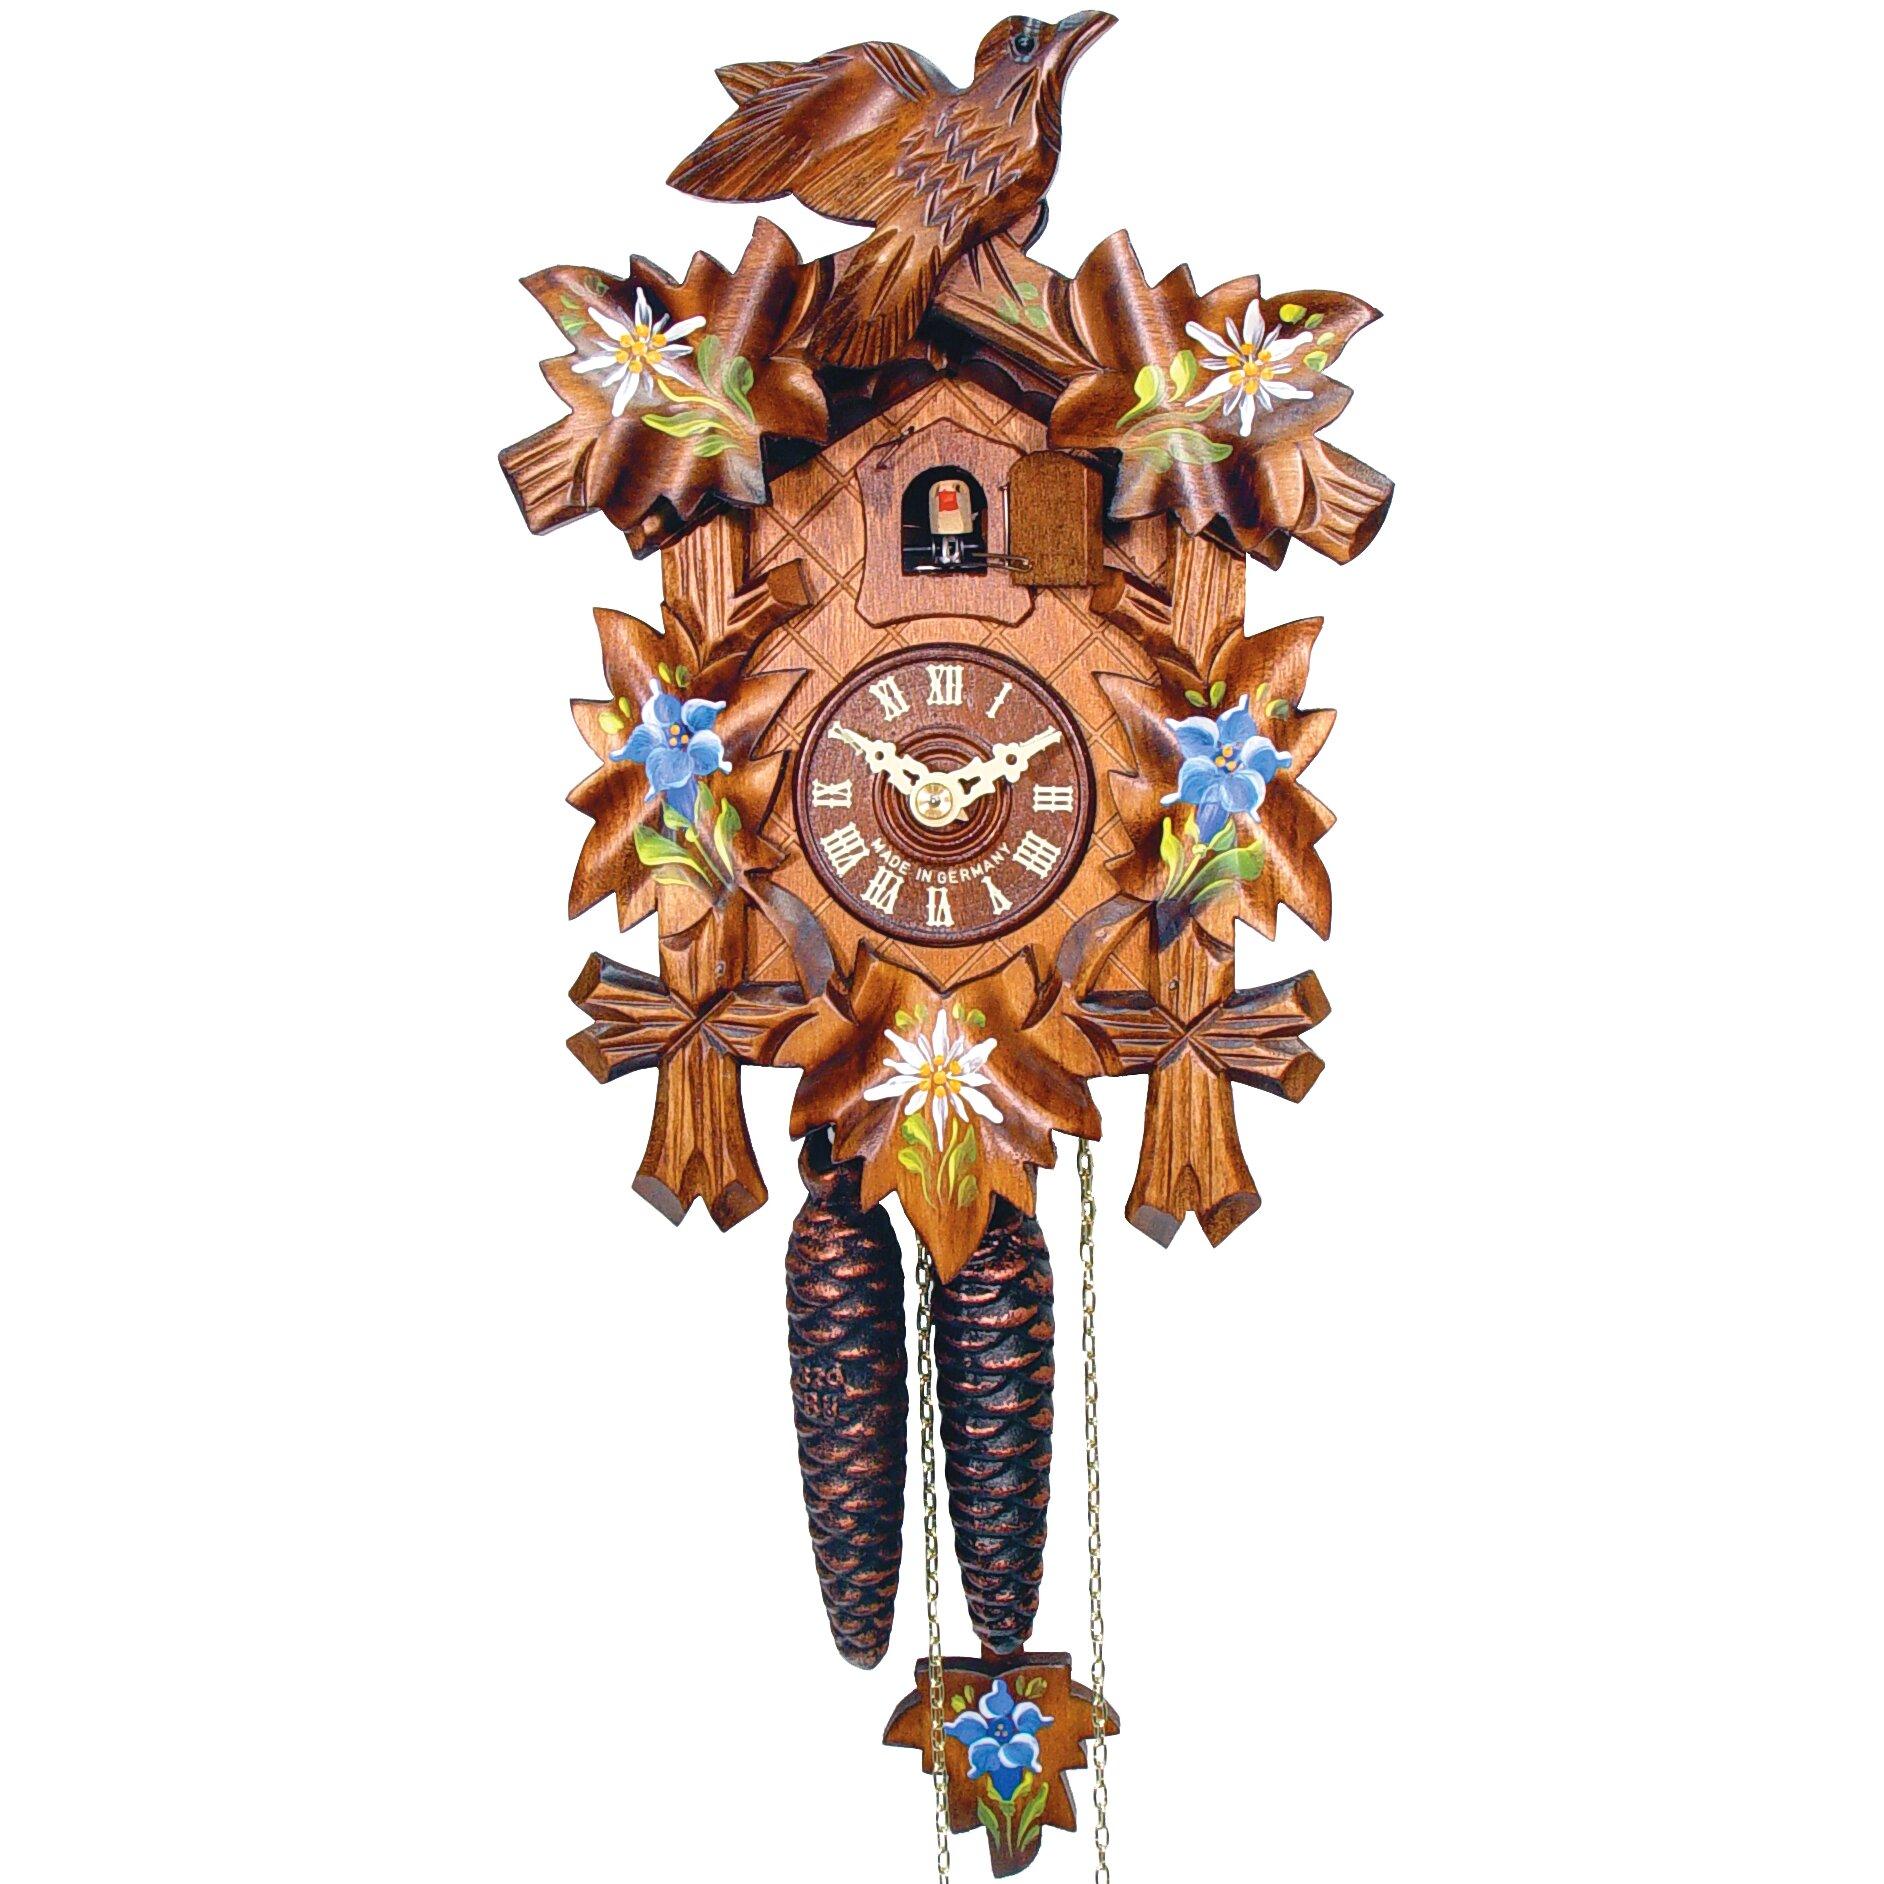 Black Forest Cuckoo Clock amp Reviews Wayfair : CuckooClockwithBlueFlowersandWalnutFinish from www.wayfair.com size 1884 x 1884 jpeg 538kB